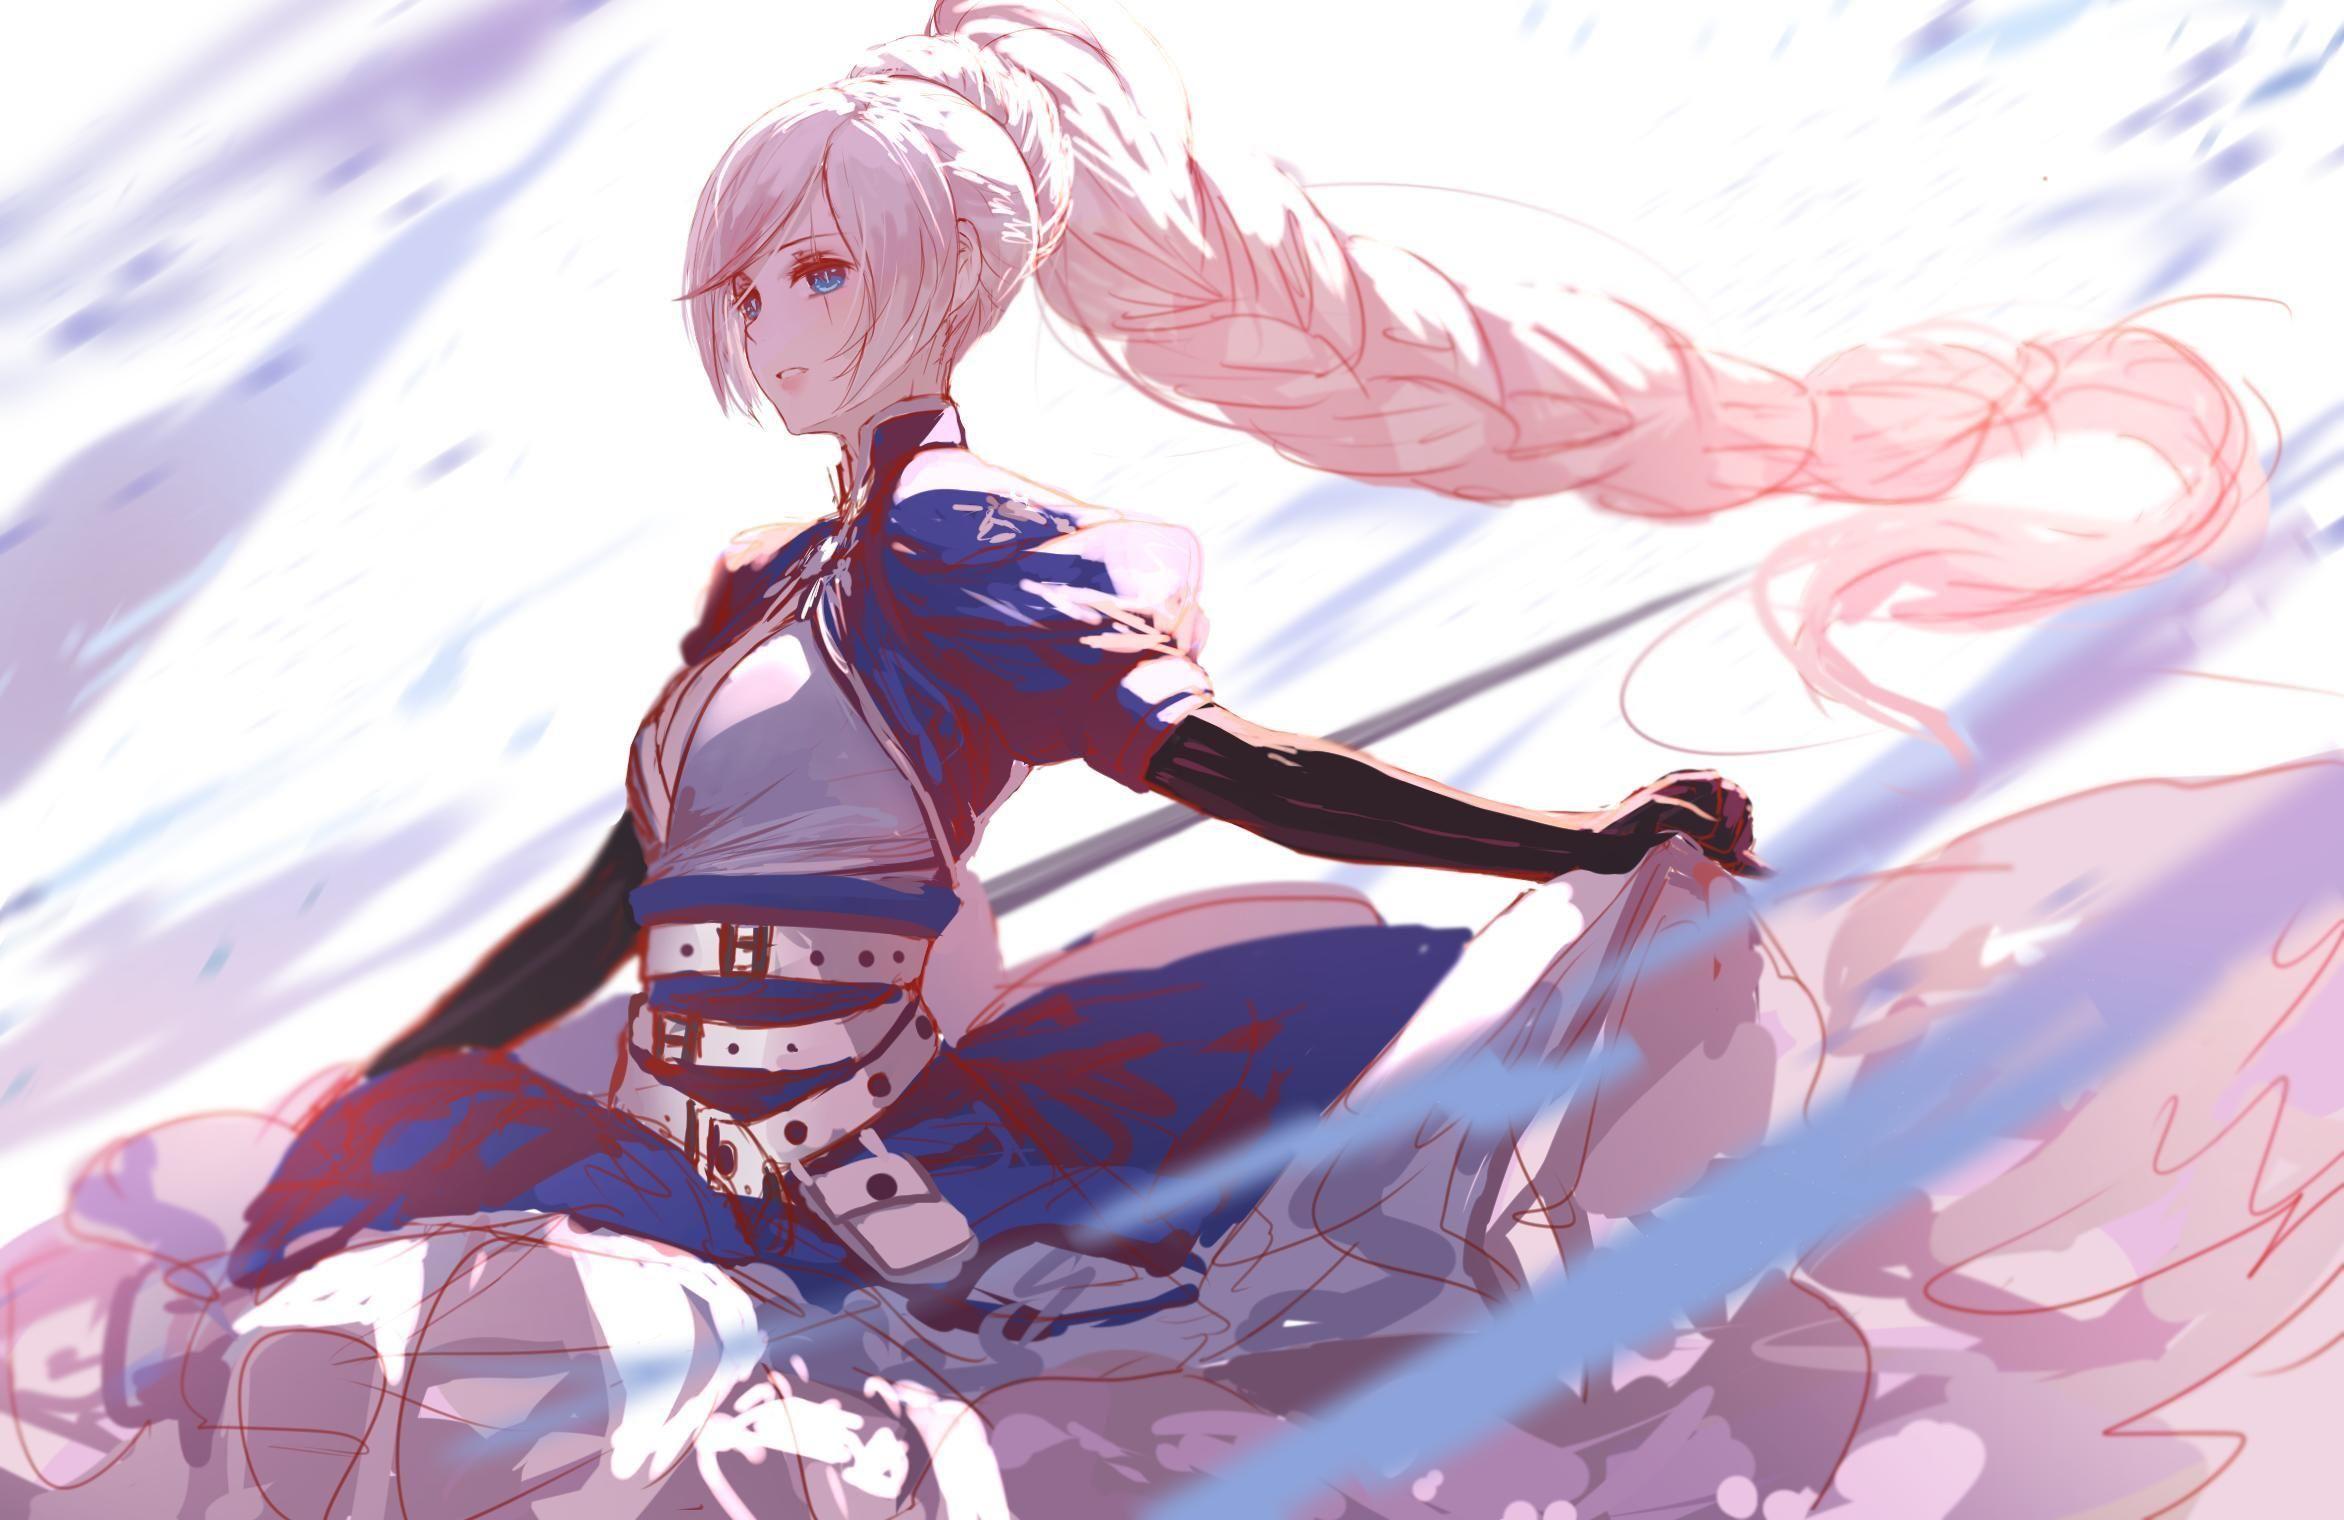 Queen Of The World Rwby Rwby Anime Rwby Anime